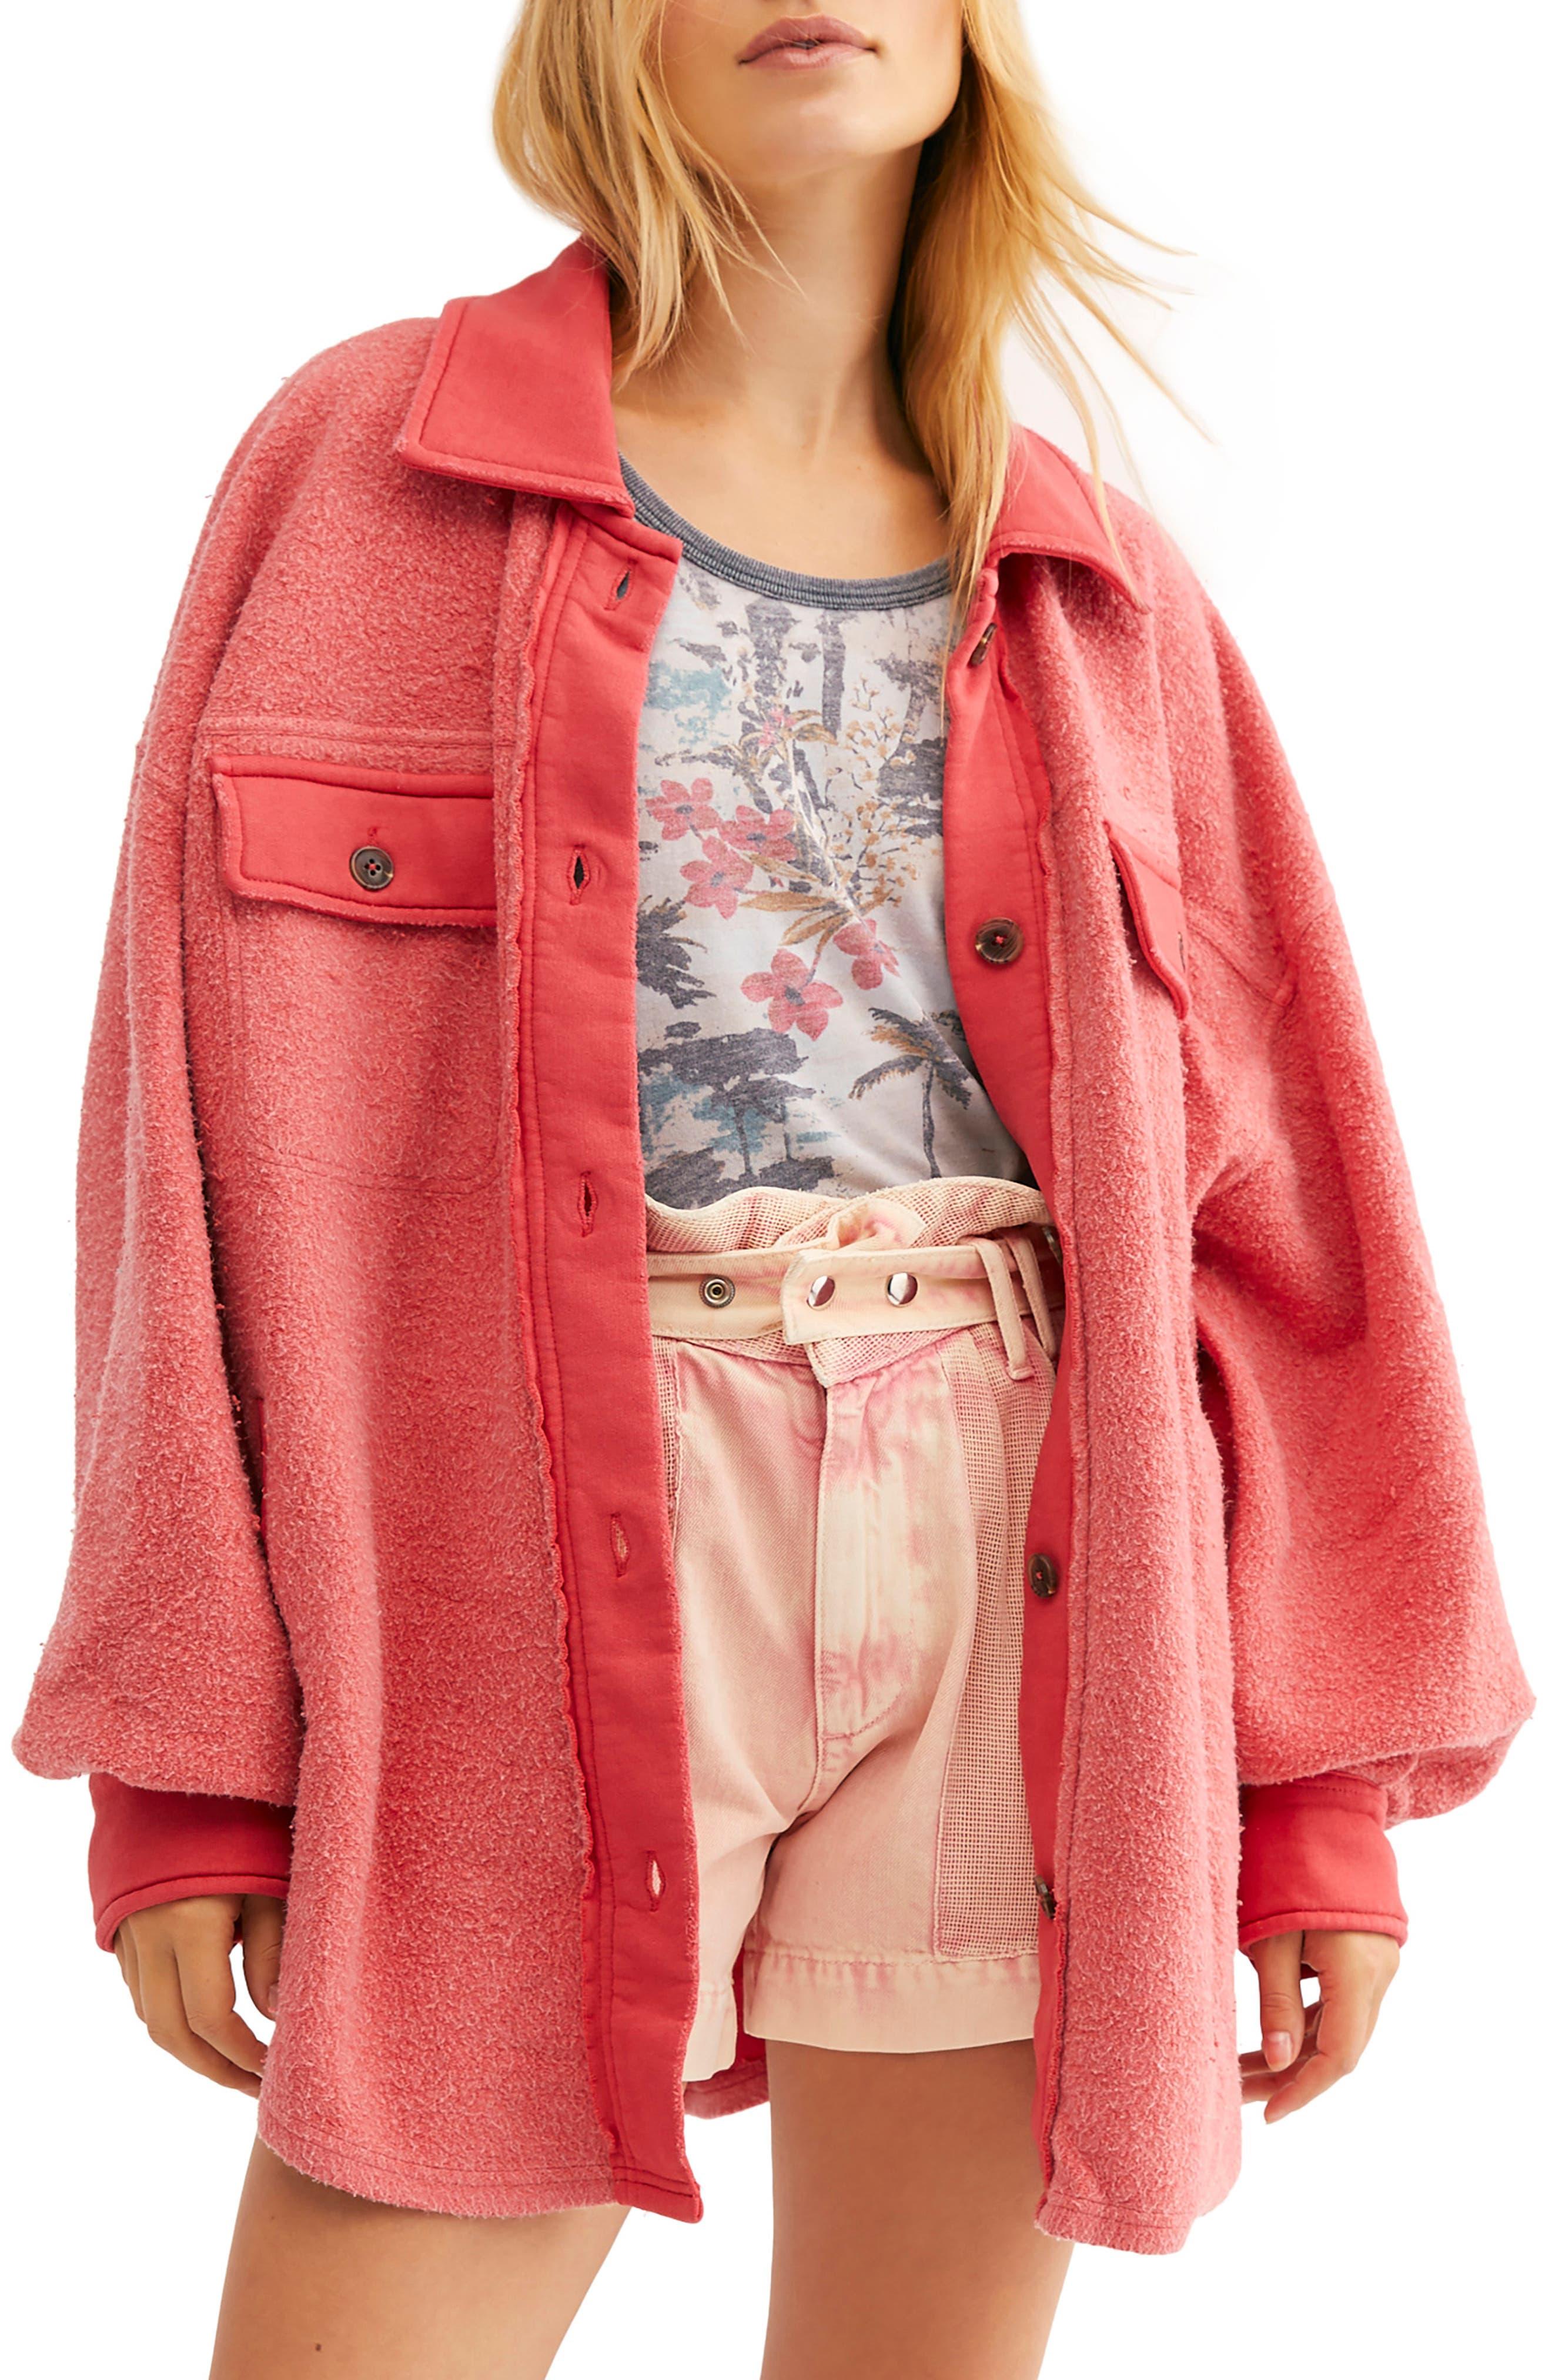 Free People Ruby Oversize Jacket Washed Black NEW RRP £108